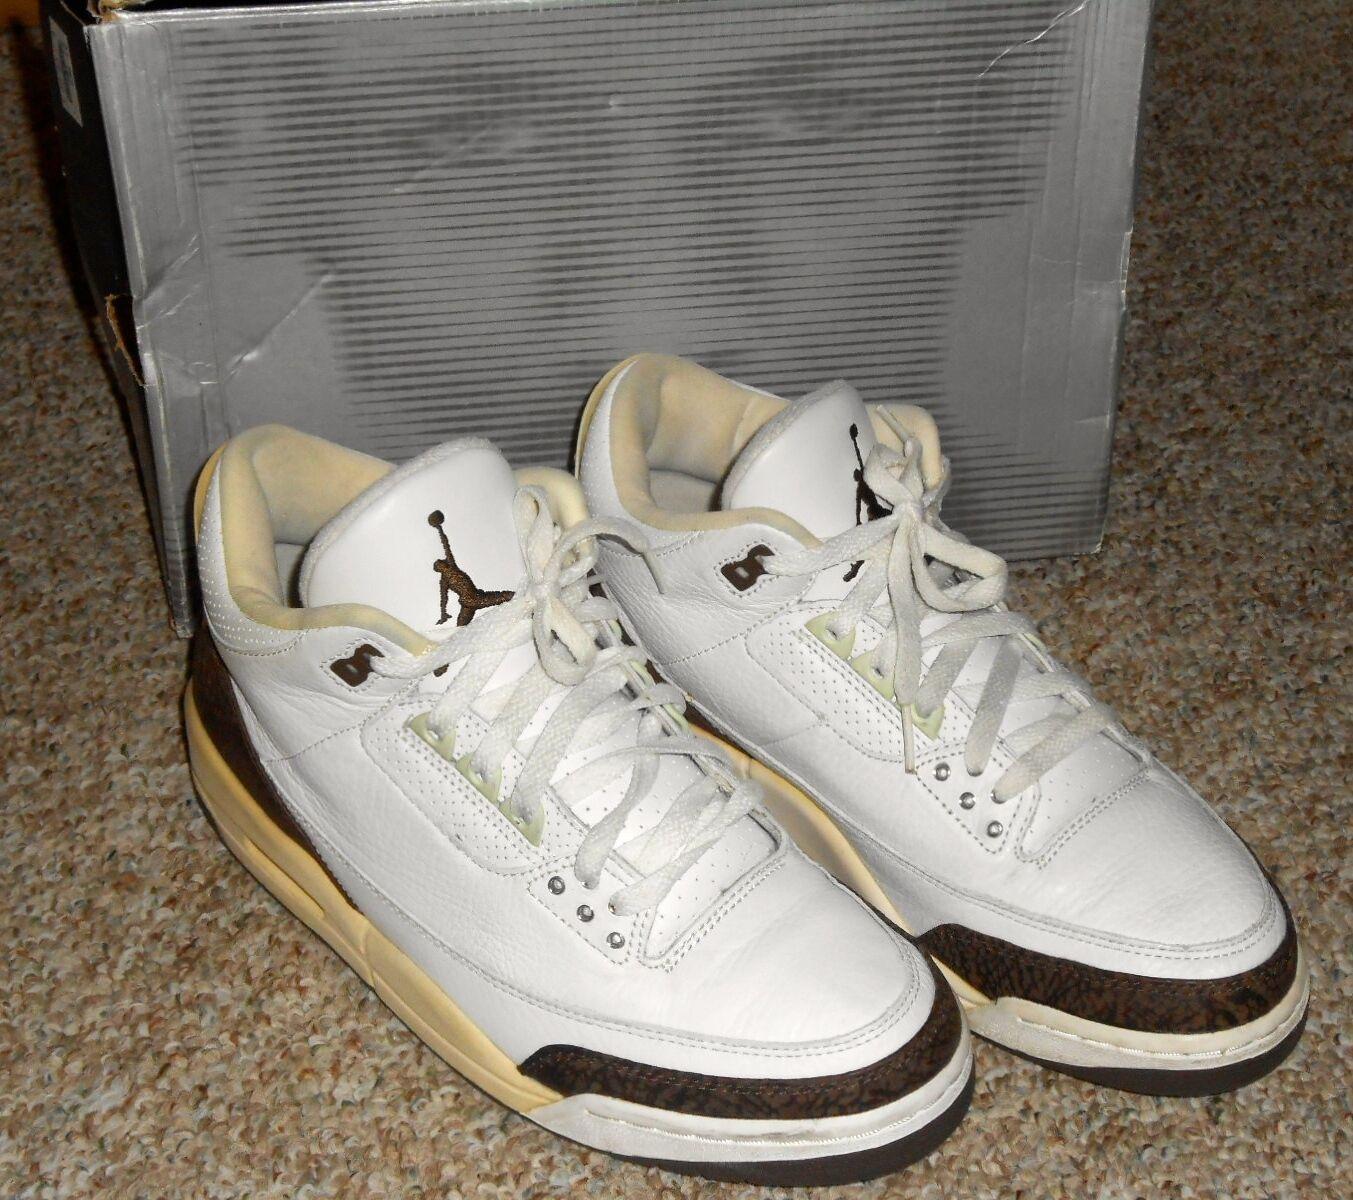 c1d8dc12bdb10 Nike Air Jordan 3 III Retro White / Dark Mocha Size 10.5 136064 121 With  Box. Men's Brand New Adidas Pureboost DPR Solebox Athletic Fashion Sneakers  ...